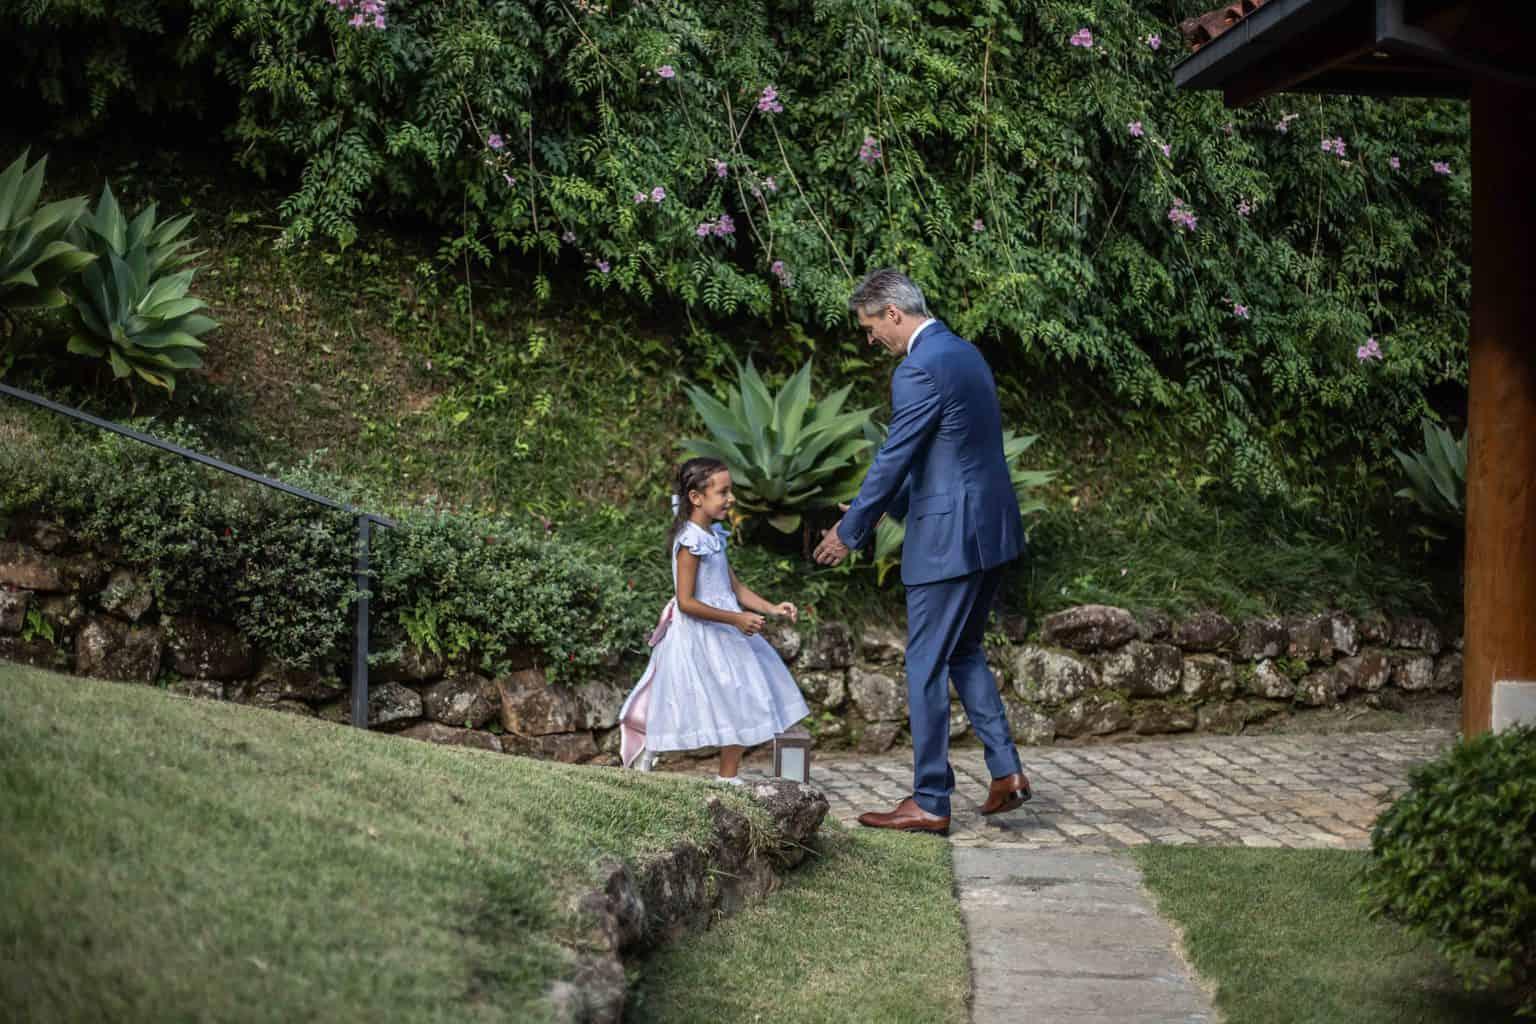 Casamento-Juliana-e-Sebastian-Fotografia-Laura-Campanella-graviola-filmes-making-of-Pousada-La-Belle-Bruna37